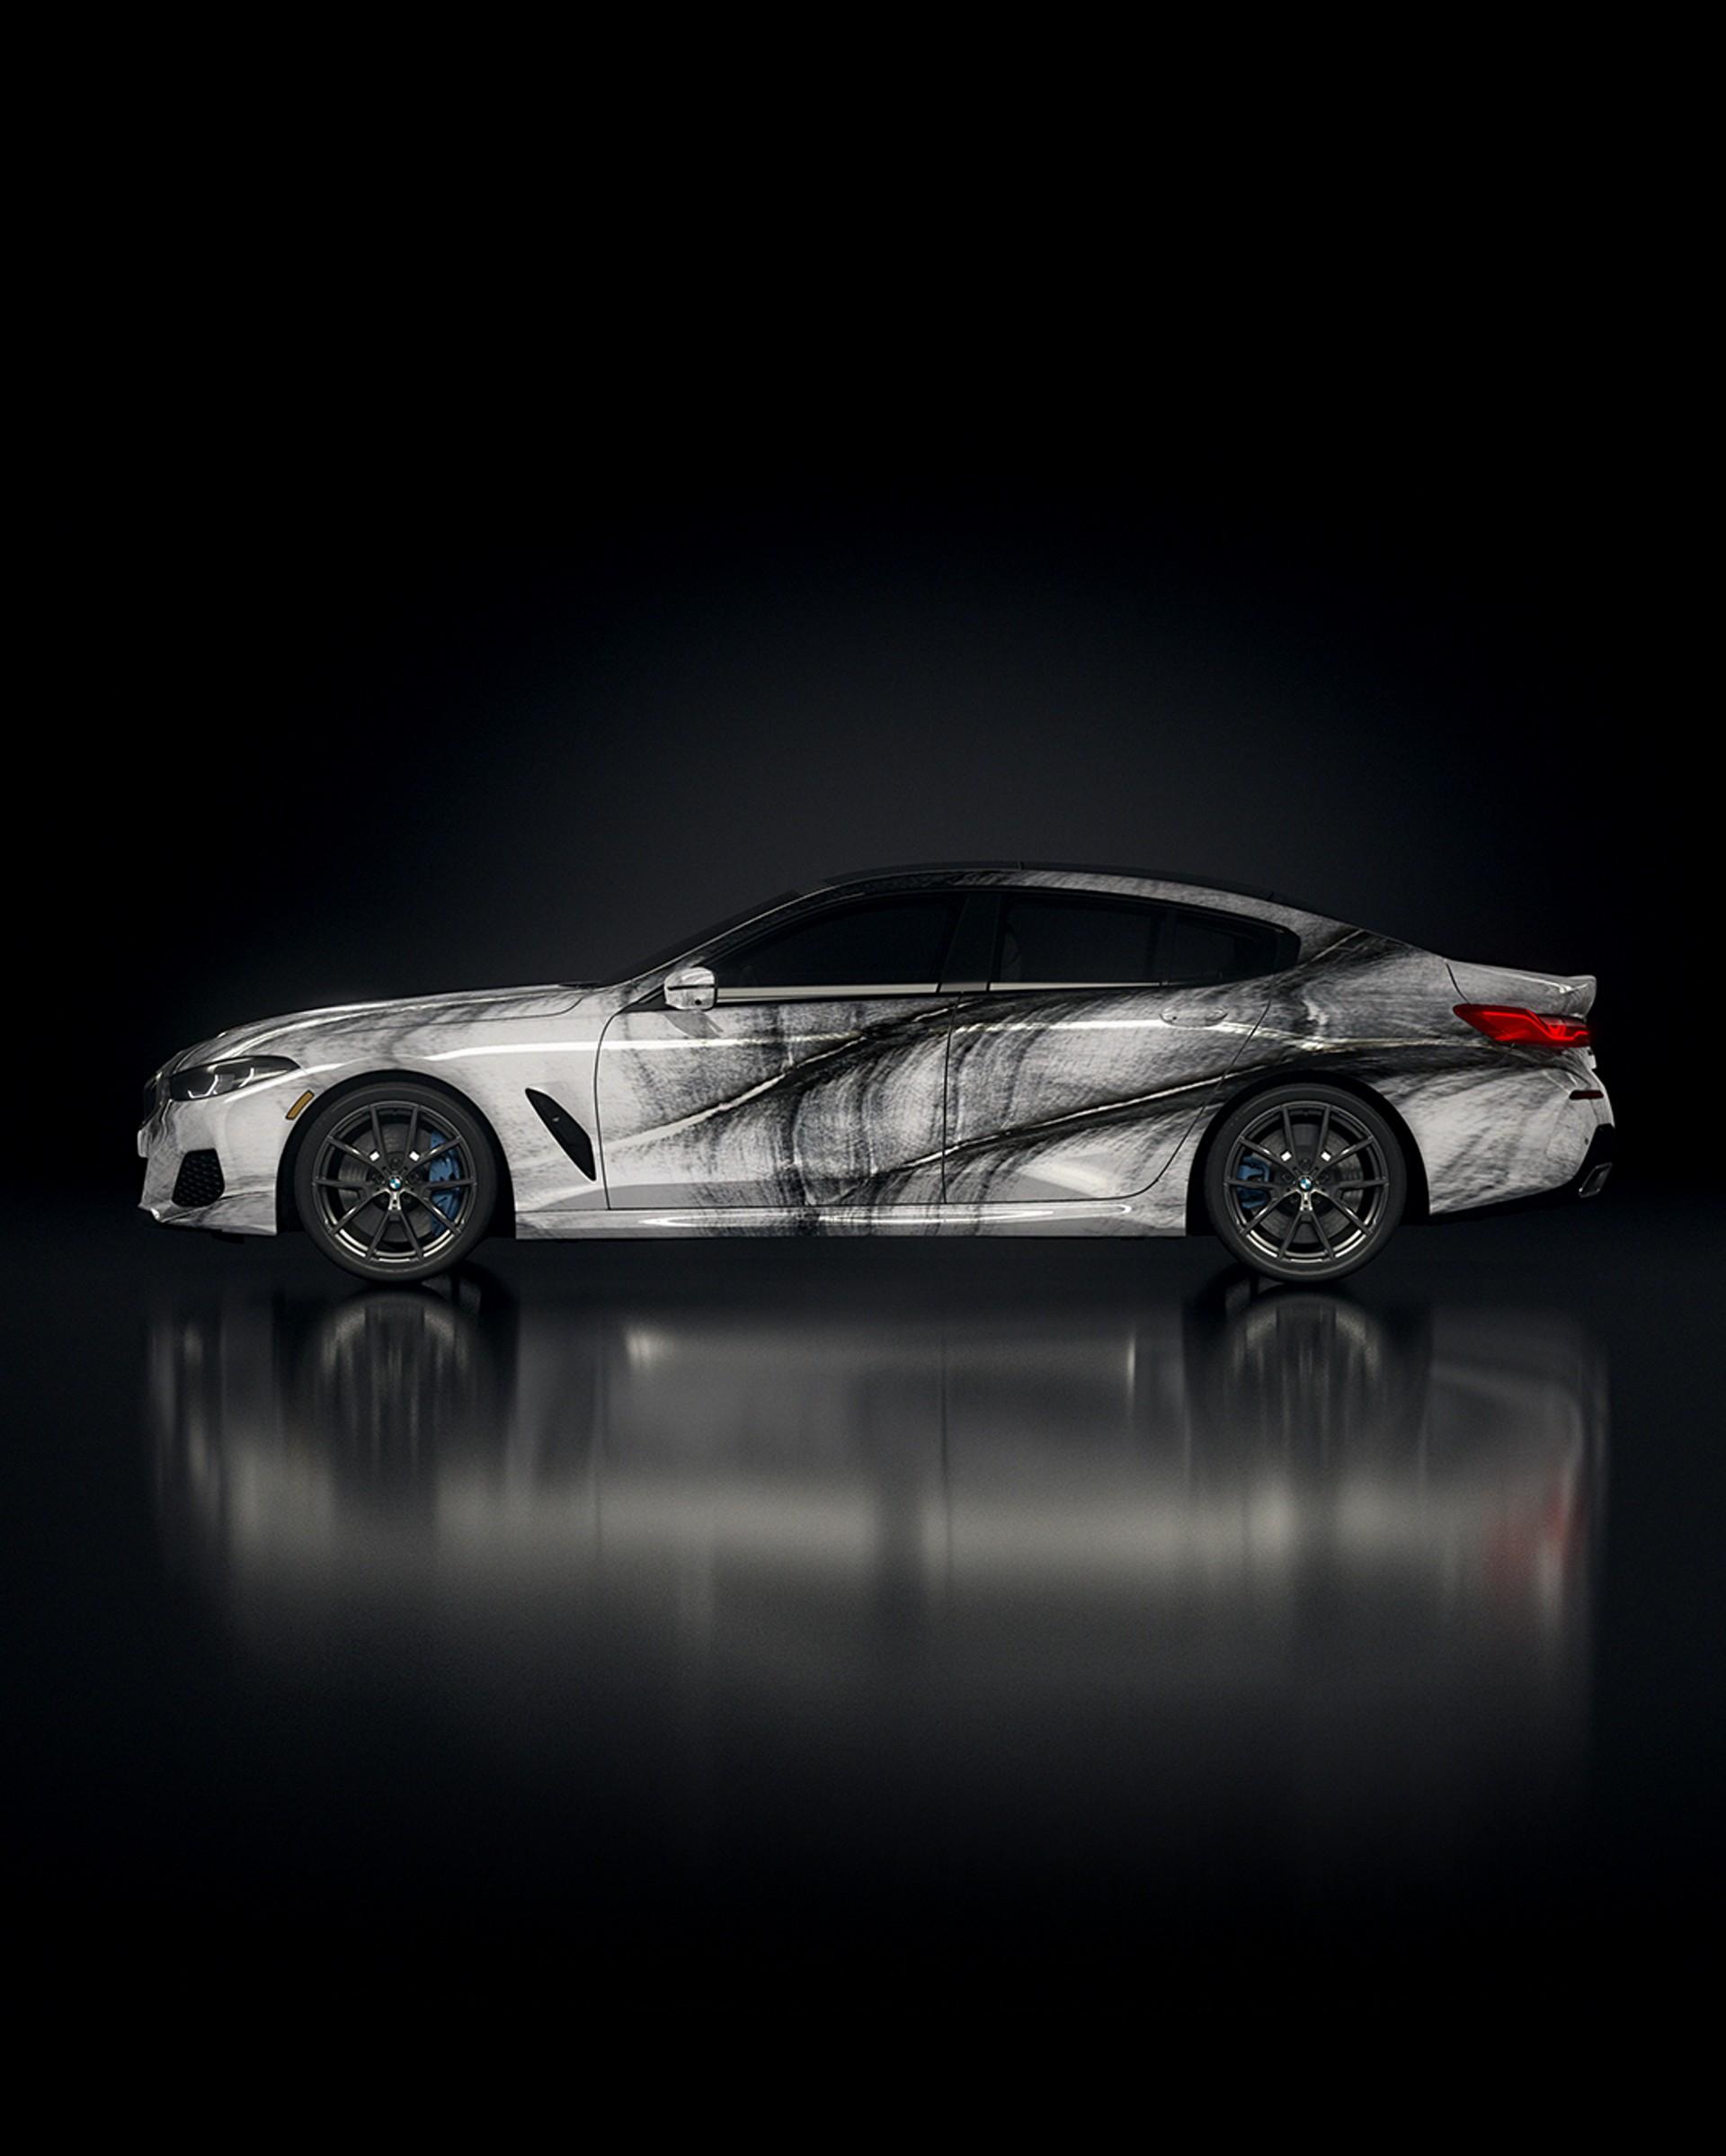 BMW-8-Series-Gran-Coupe-art-car-8